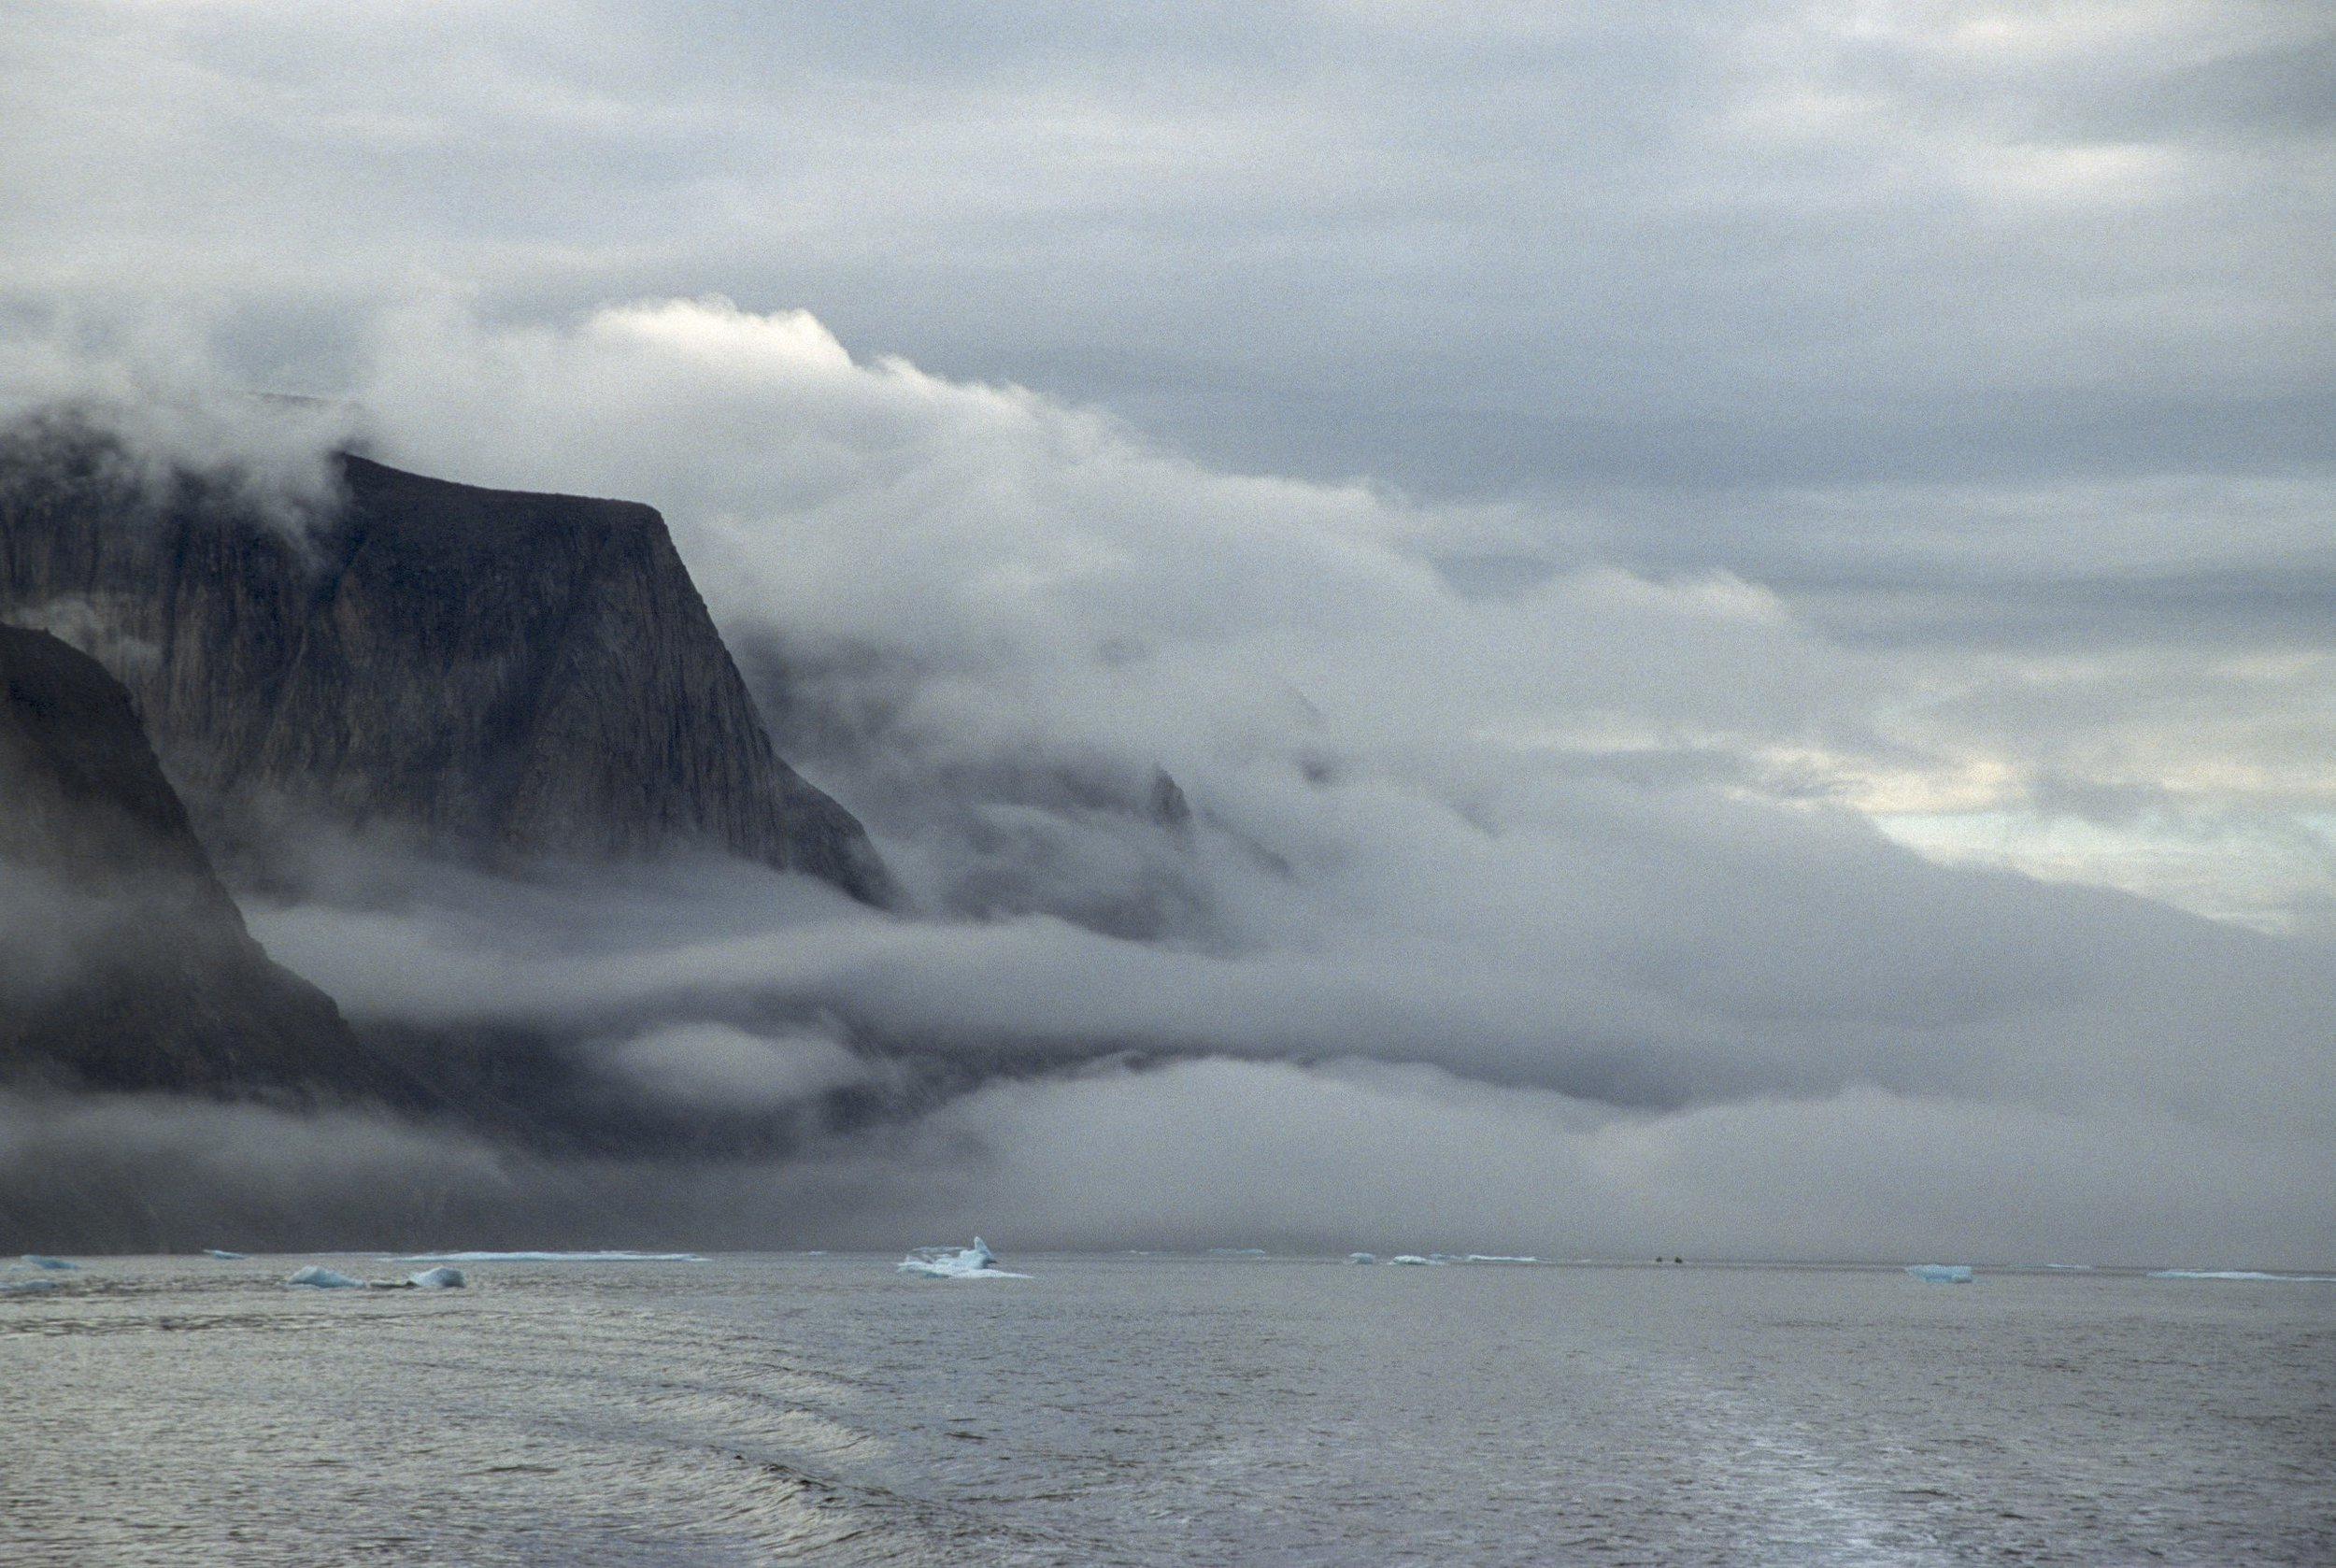 The rugged coast of Baffin Island